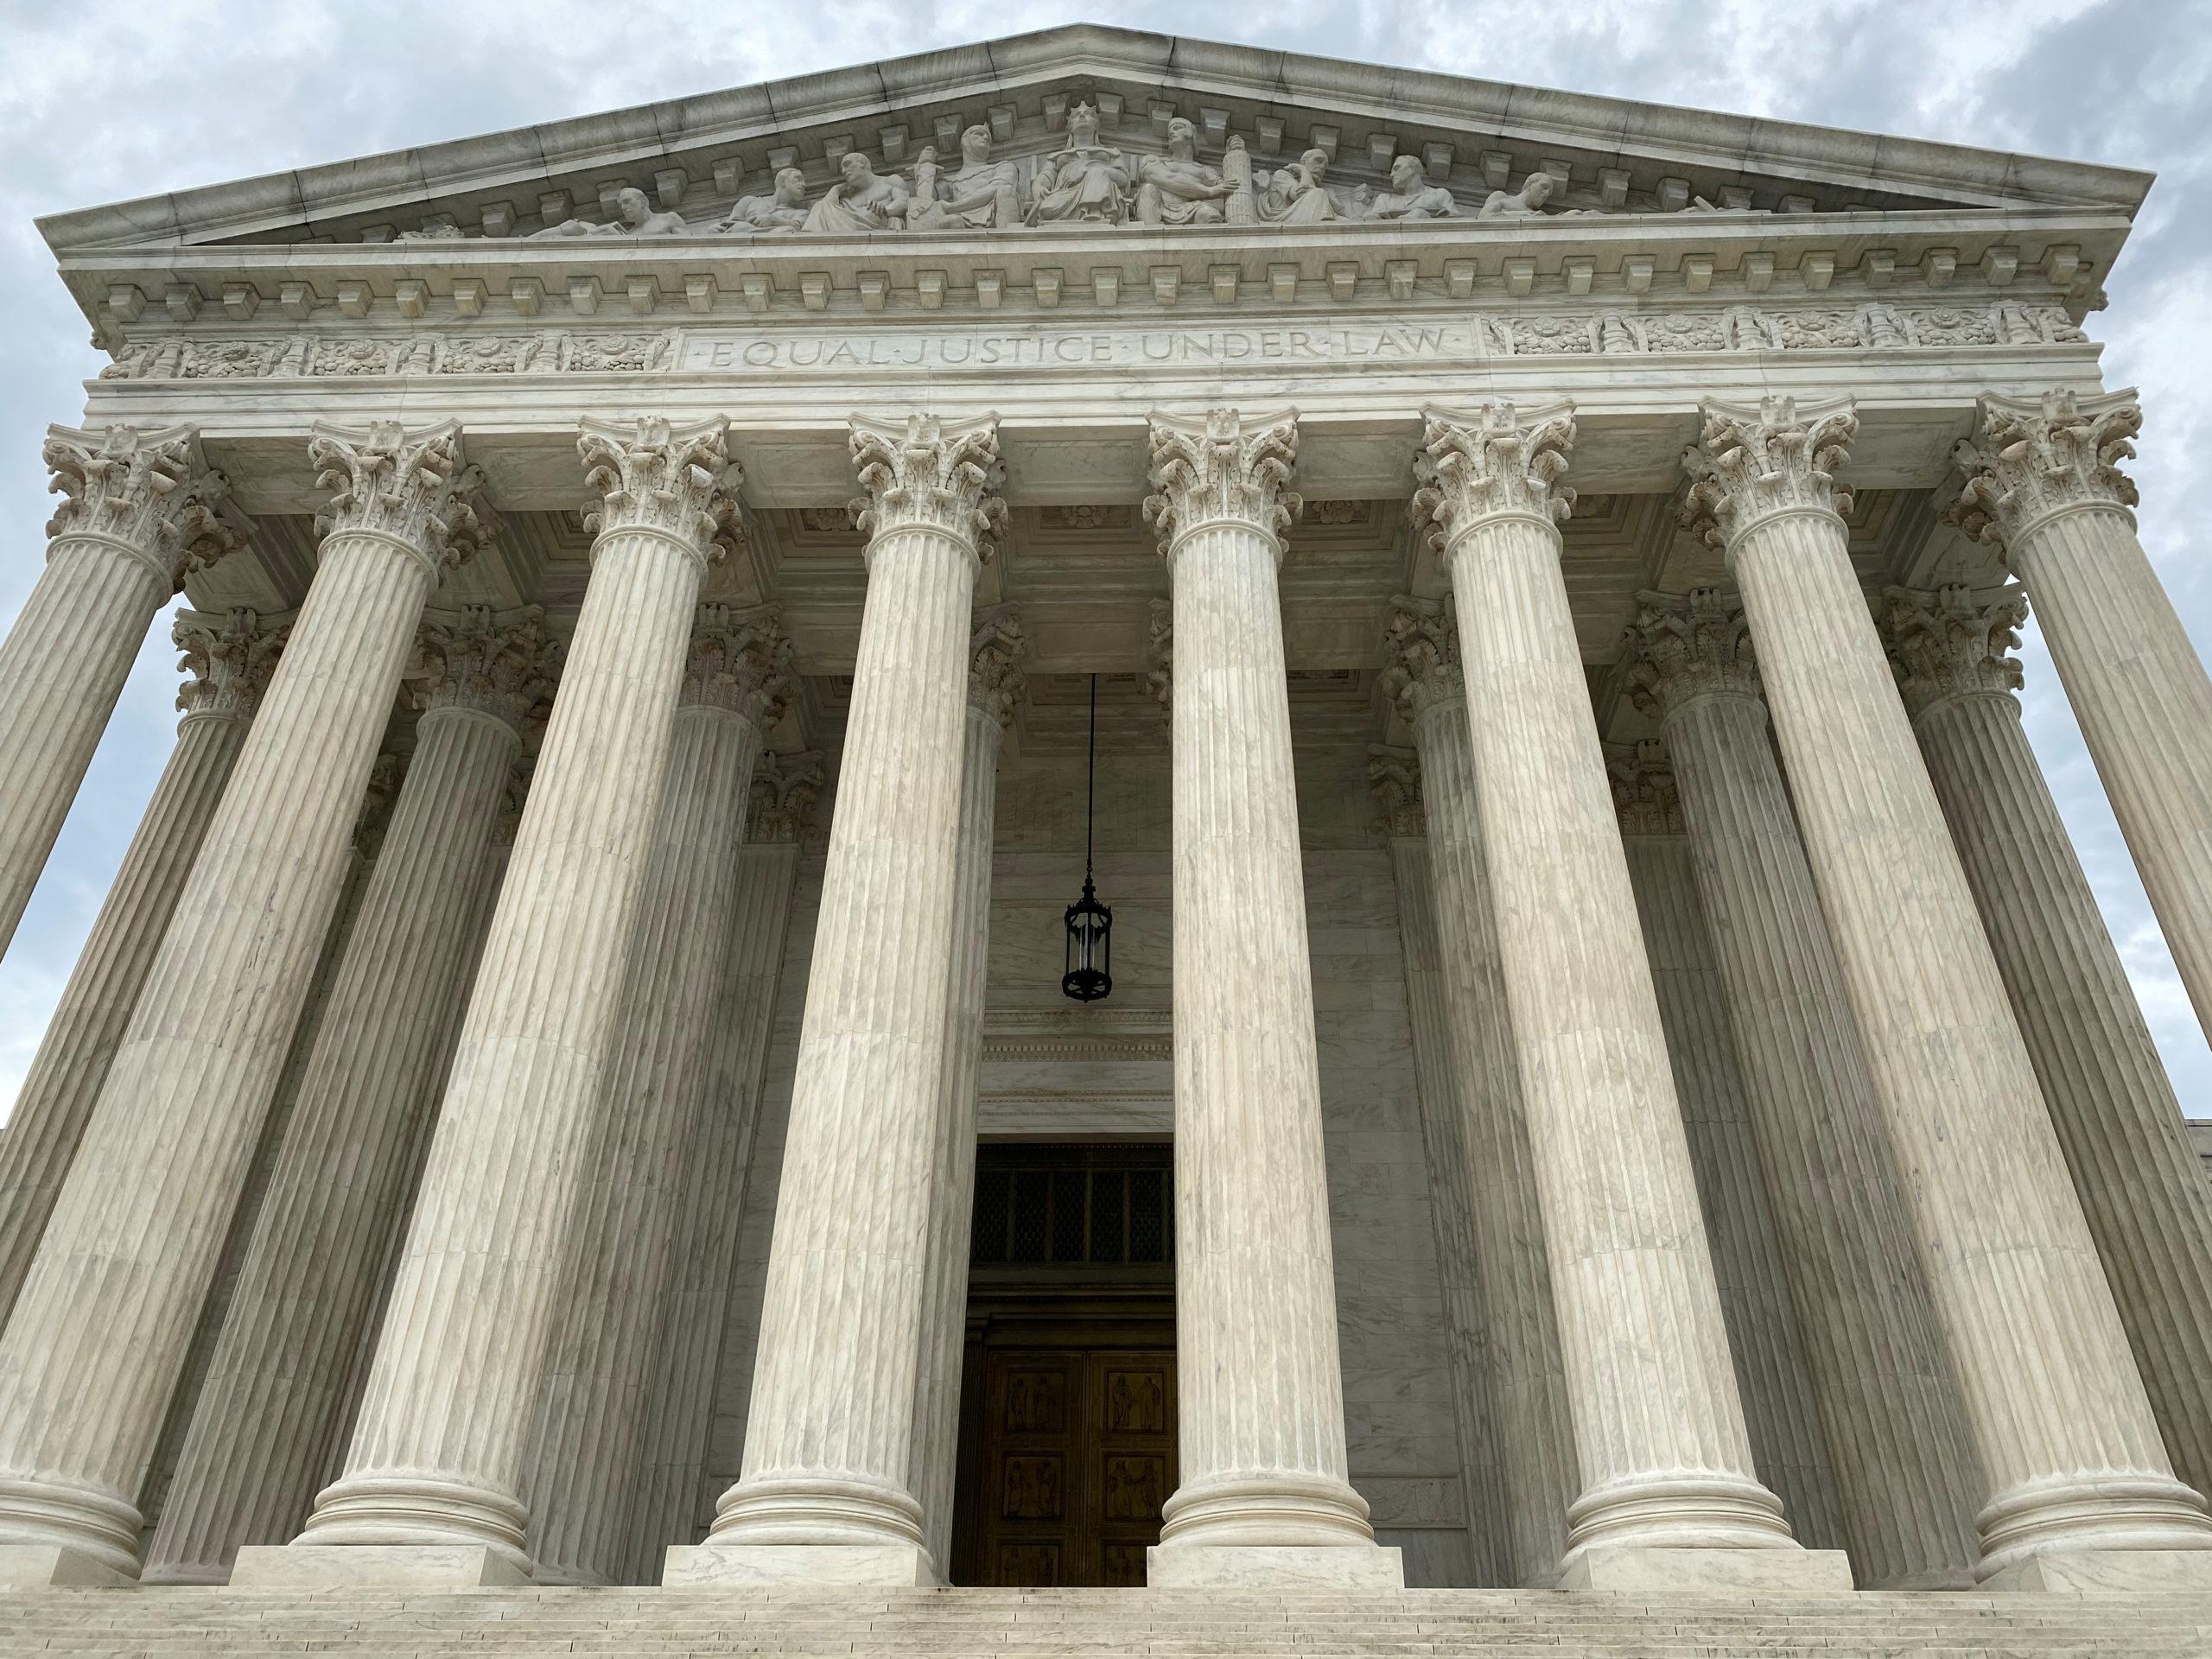 Trump annoncera vendredi ou samedi son choix pour la Cour suprême